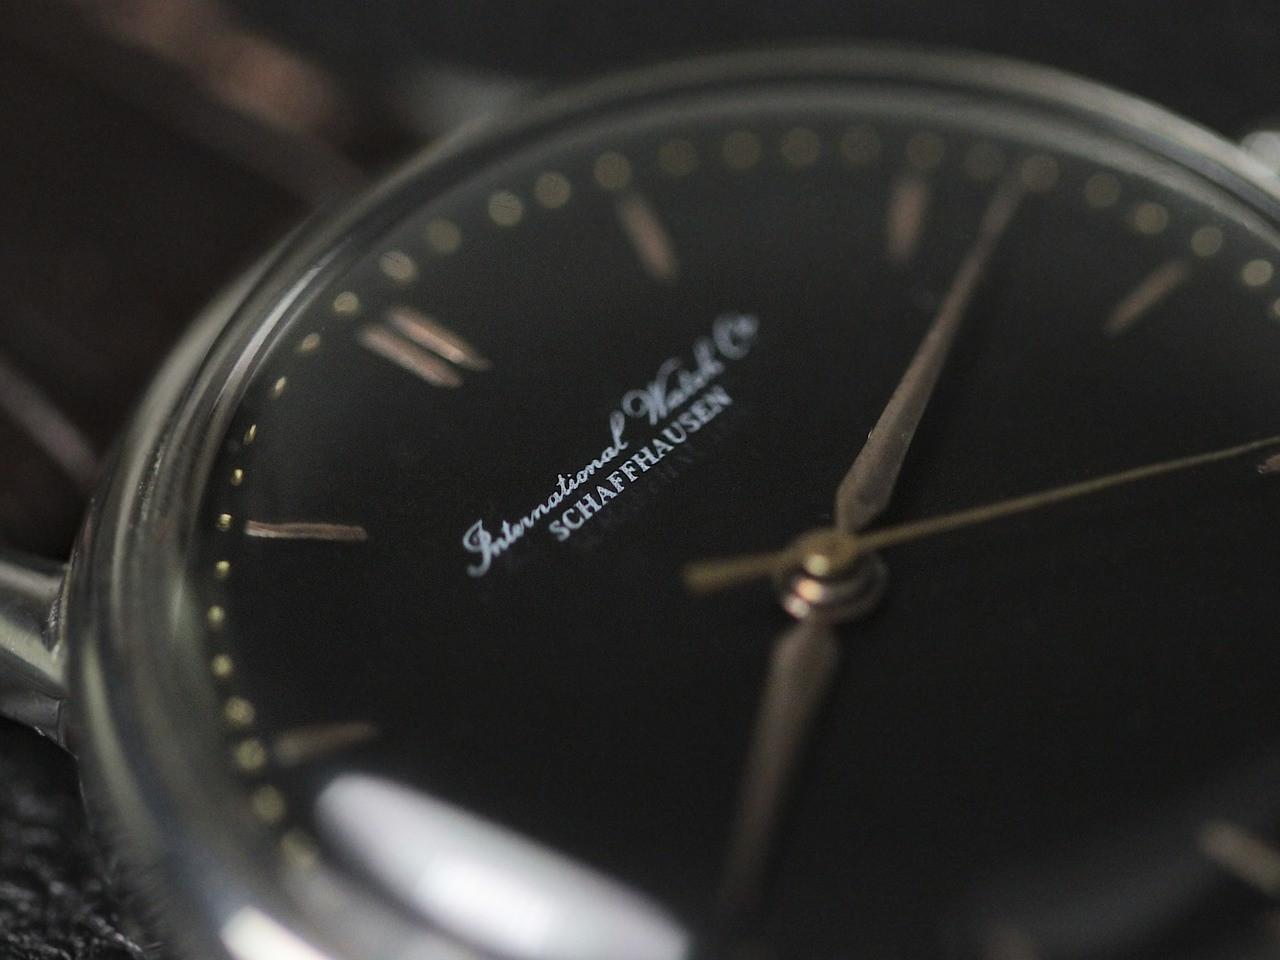 Black Dial Detail - Vintage IWC watch - Vintage Black Dial  - www.Legendoftime.com - Chicago Watch Center